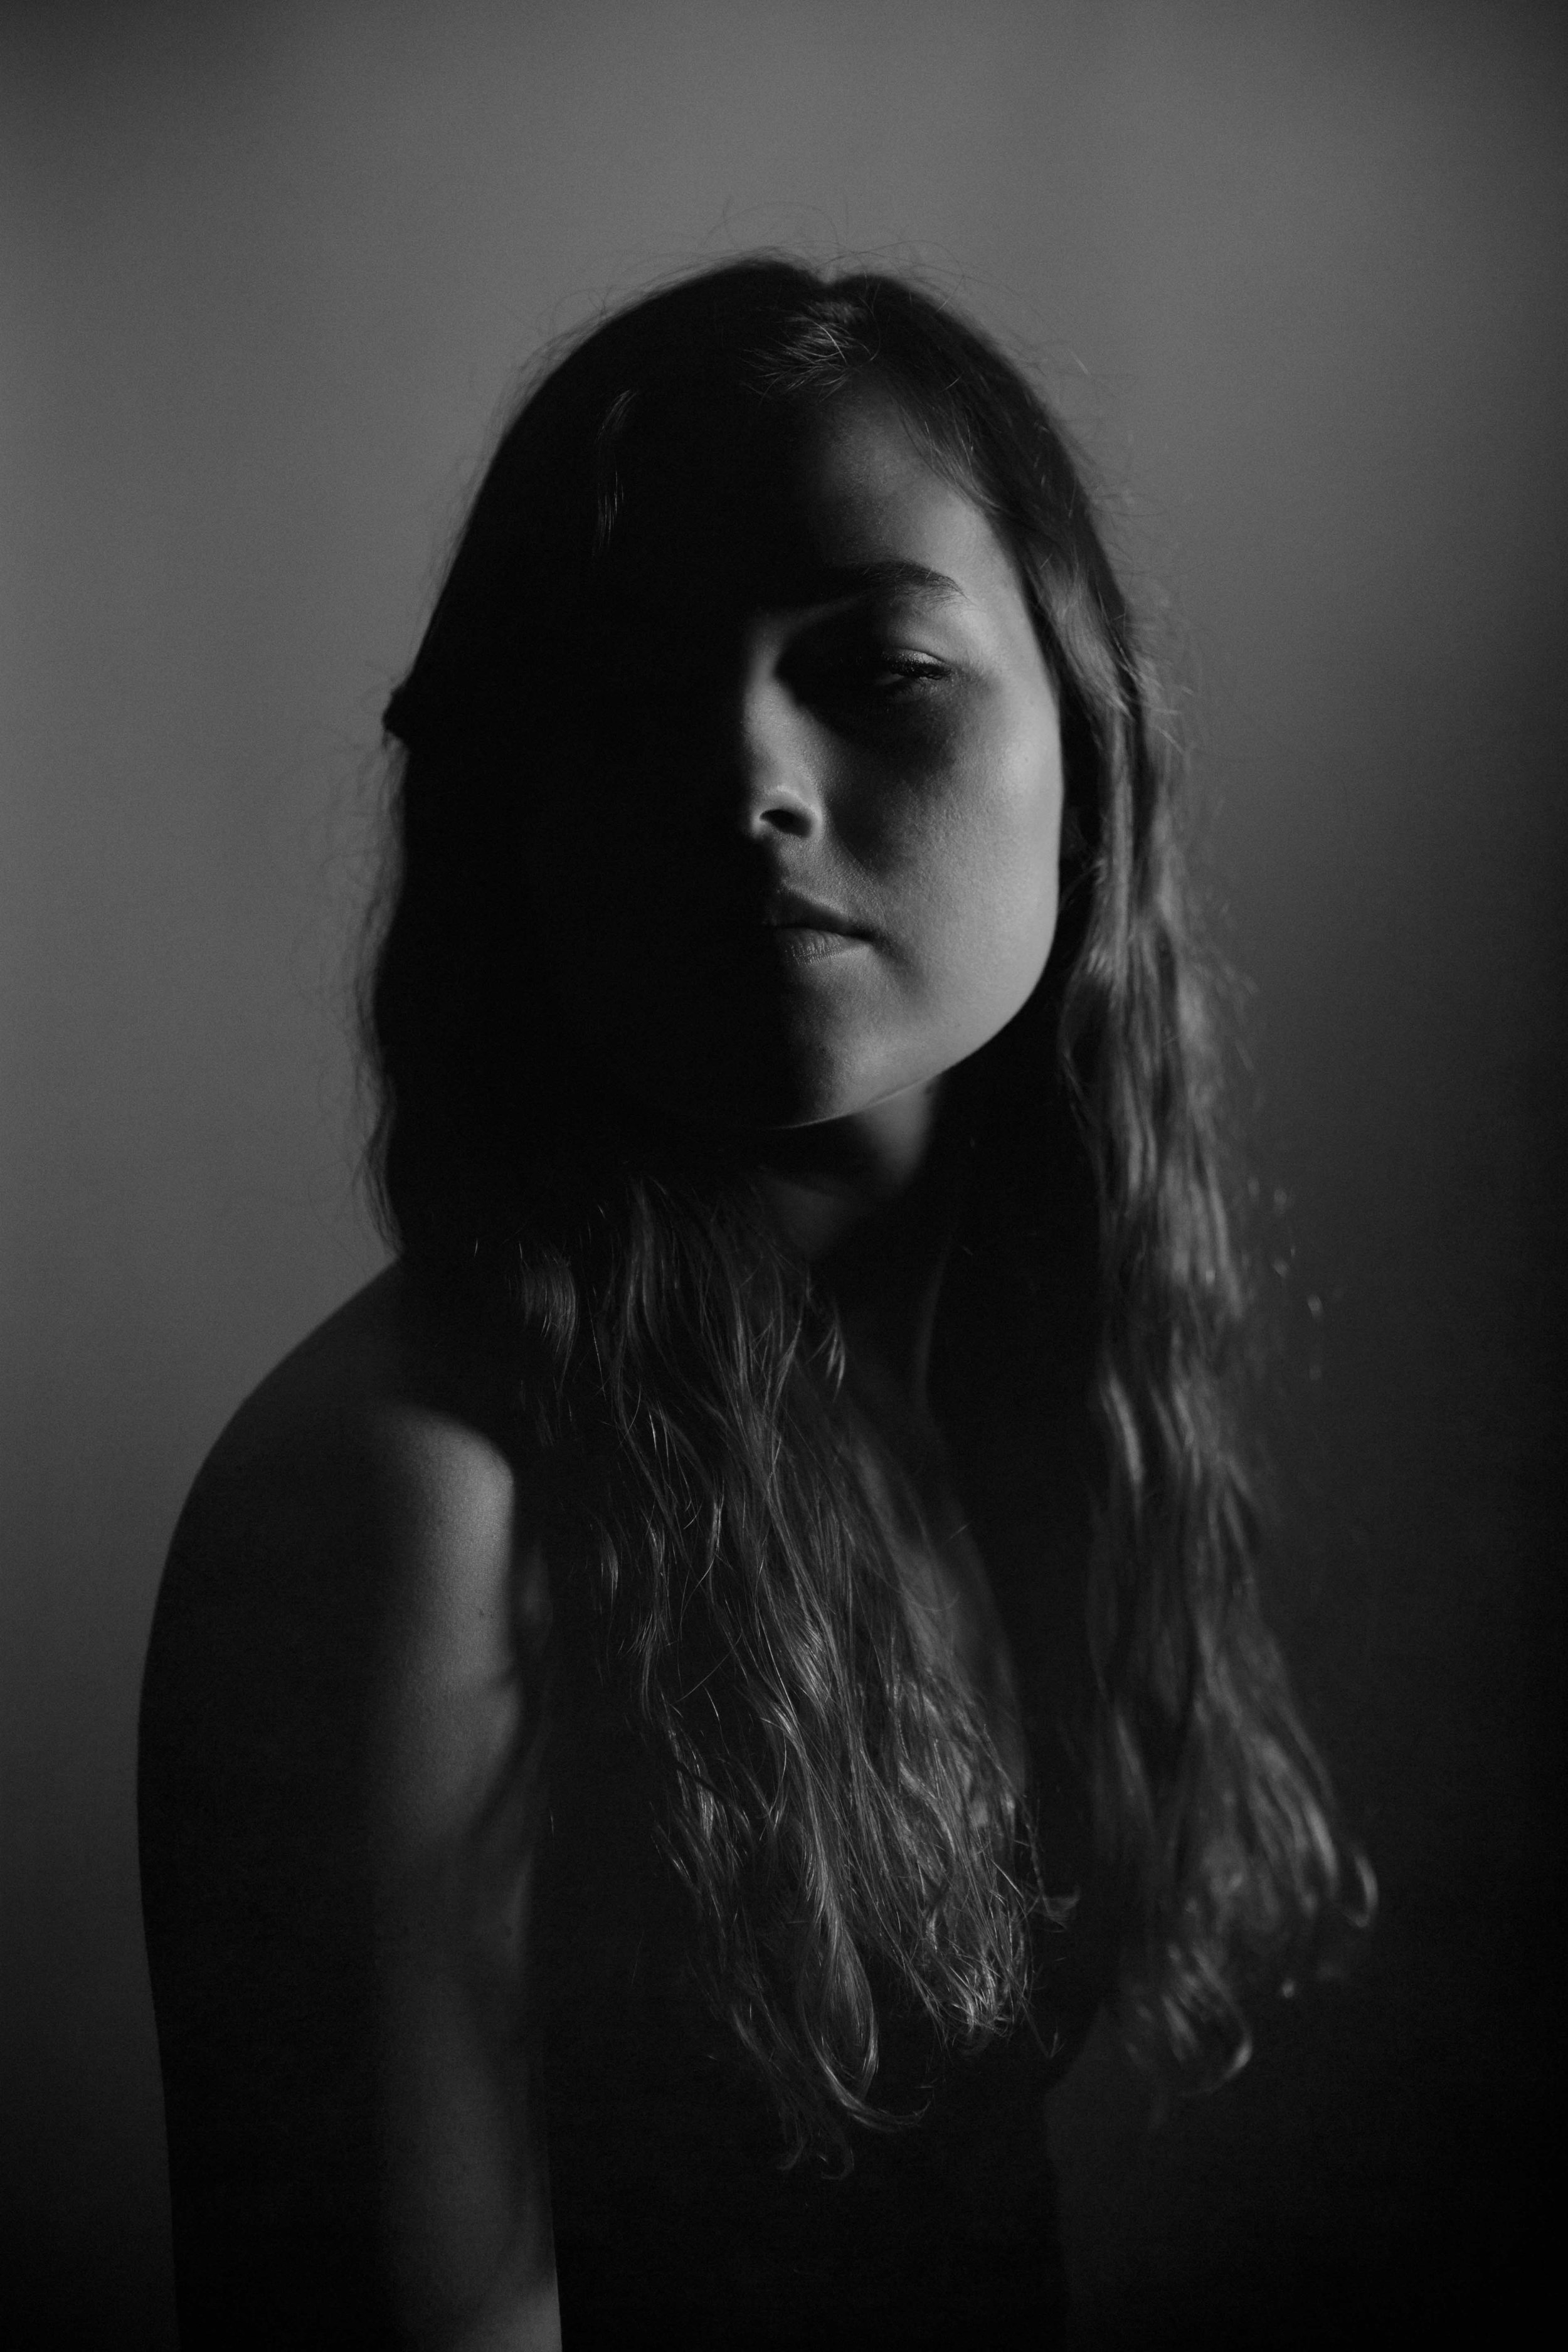 Black and White Portraits by Adrienne Battistella